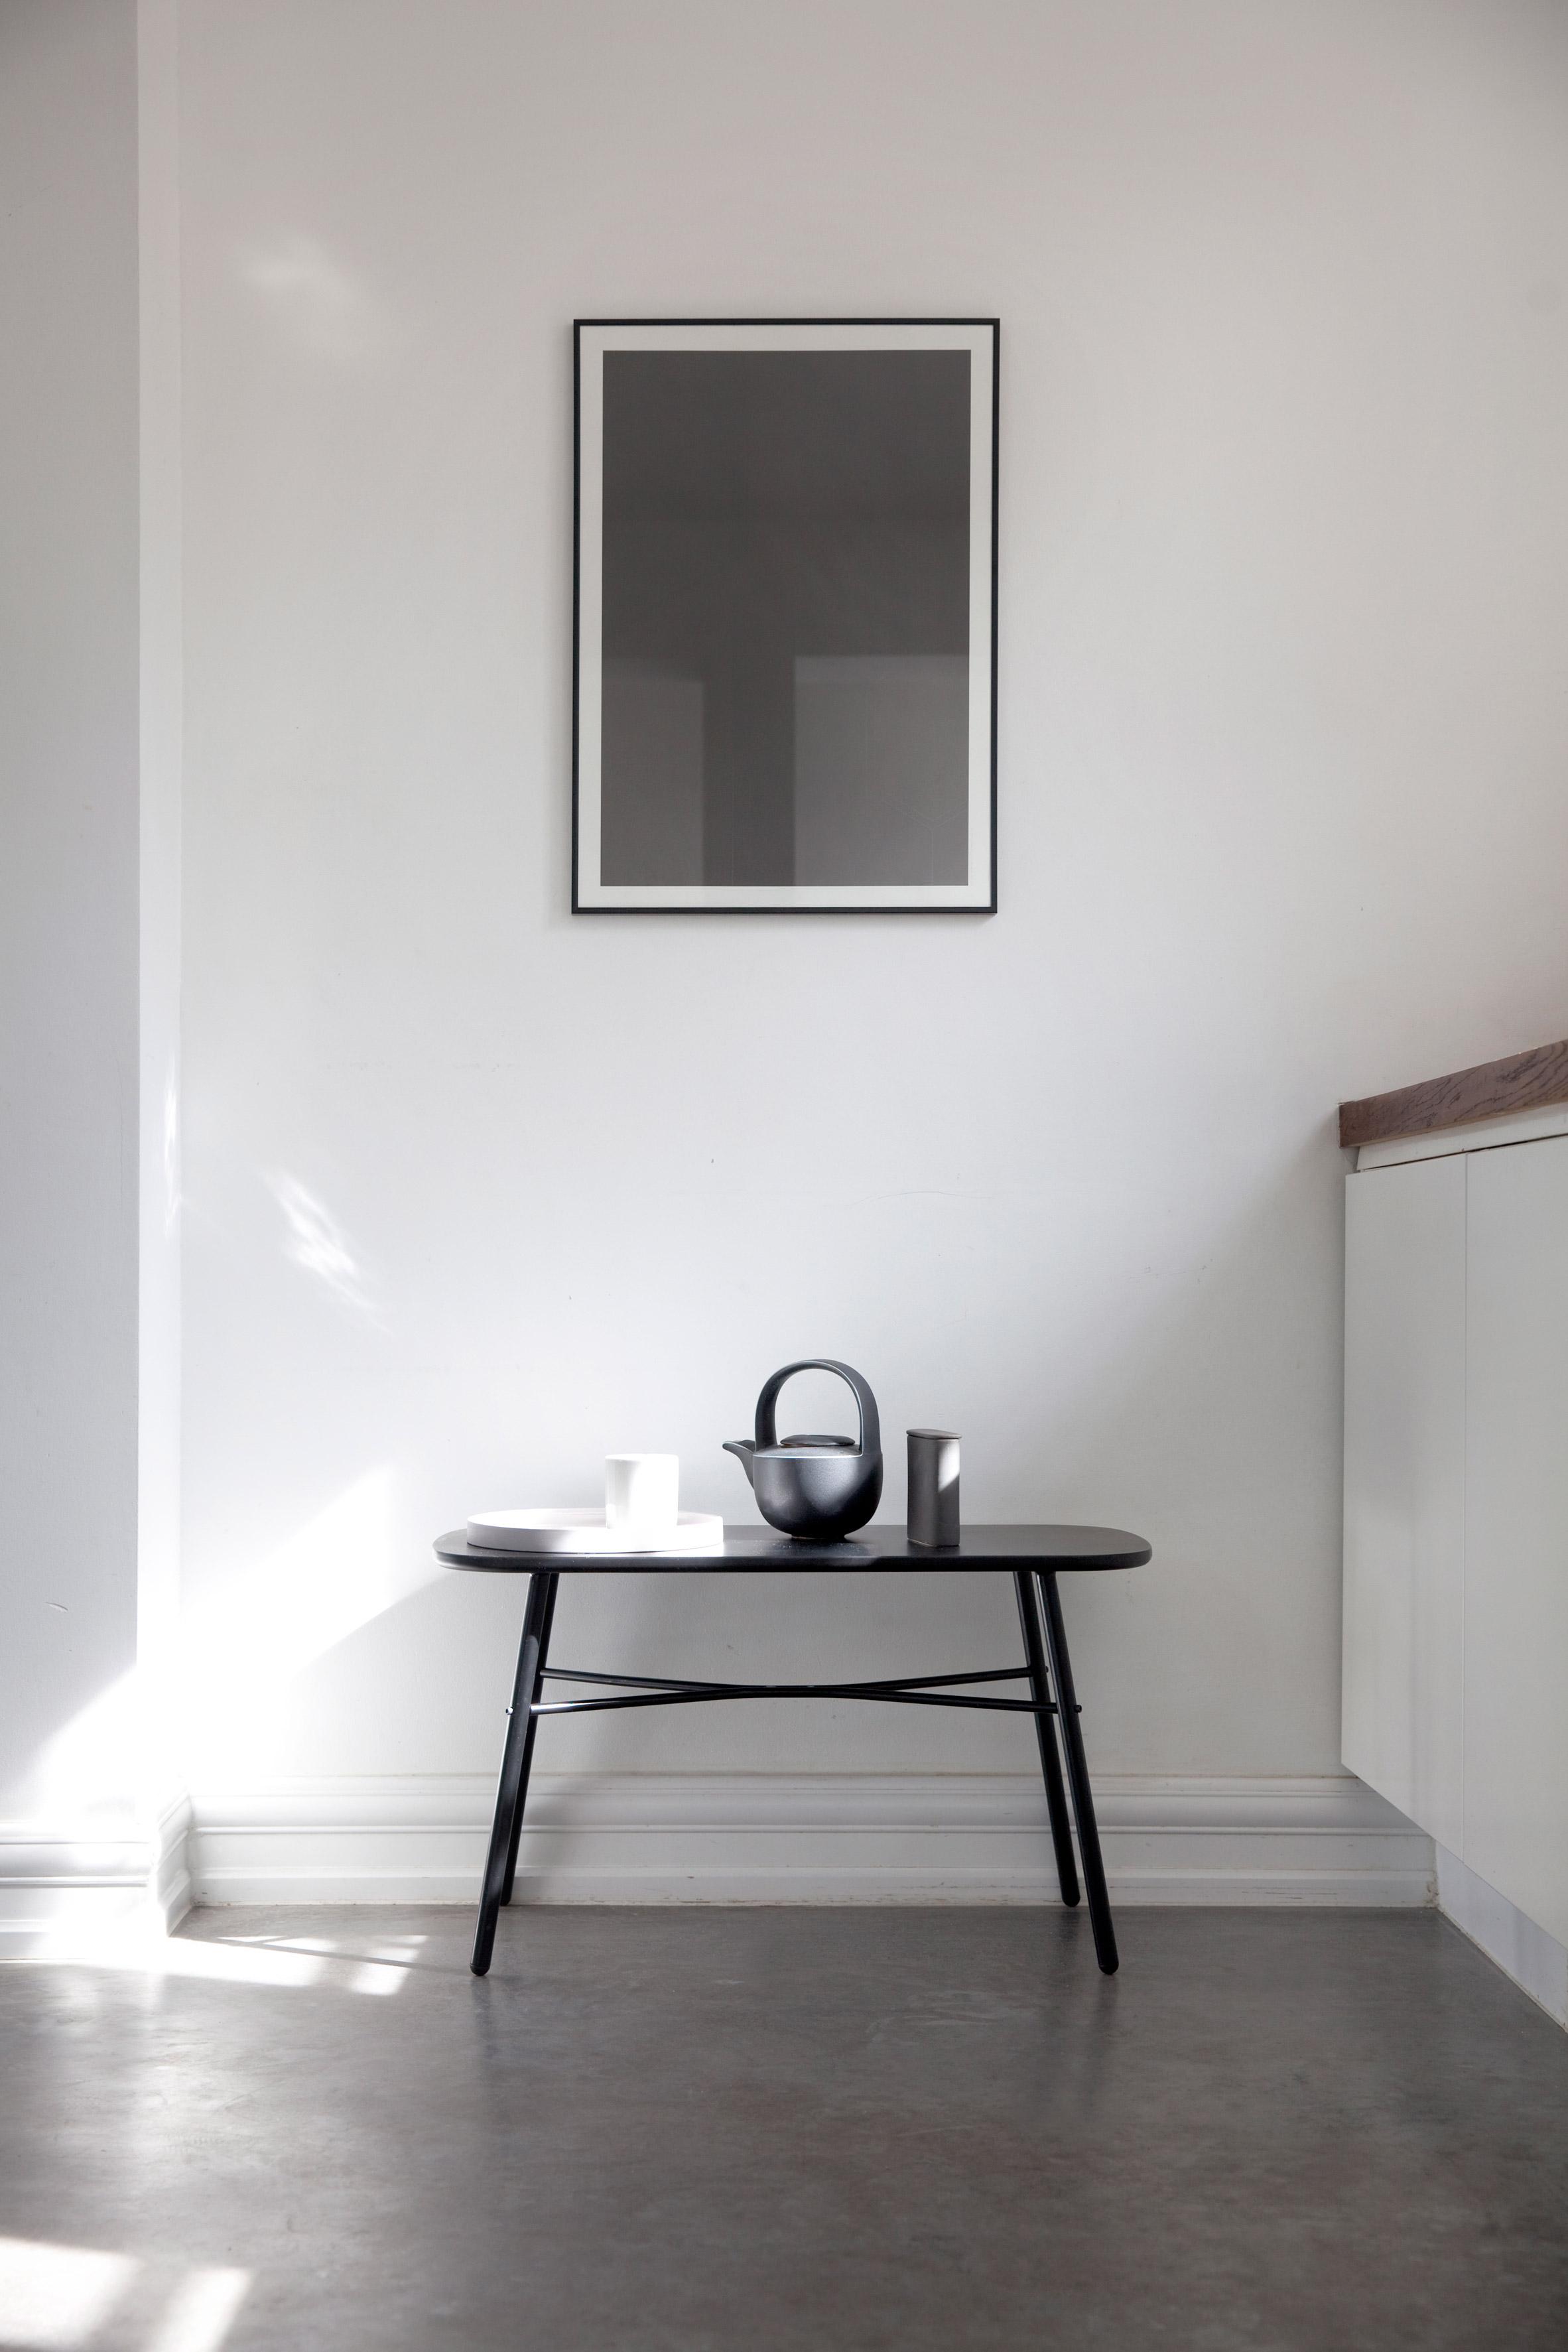 maison-objet-menu-design-furniture-lighting-tables_dezeen_2364_col_6